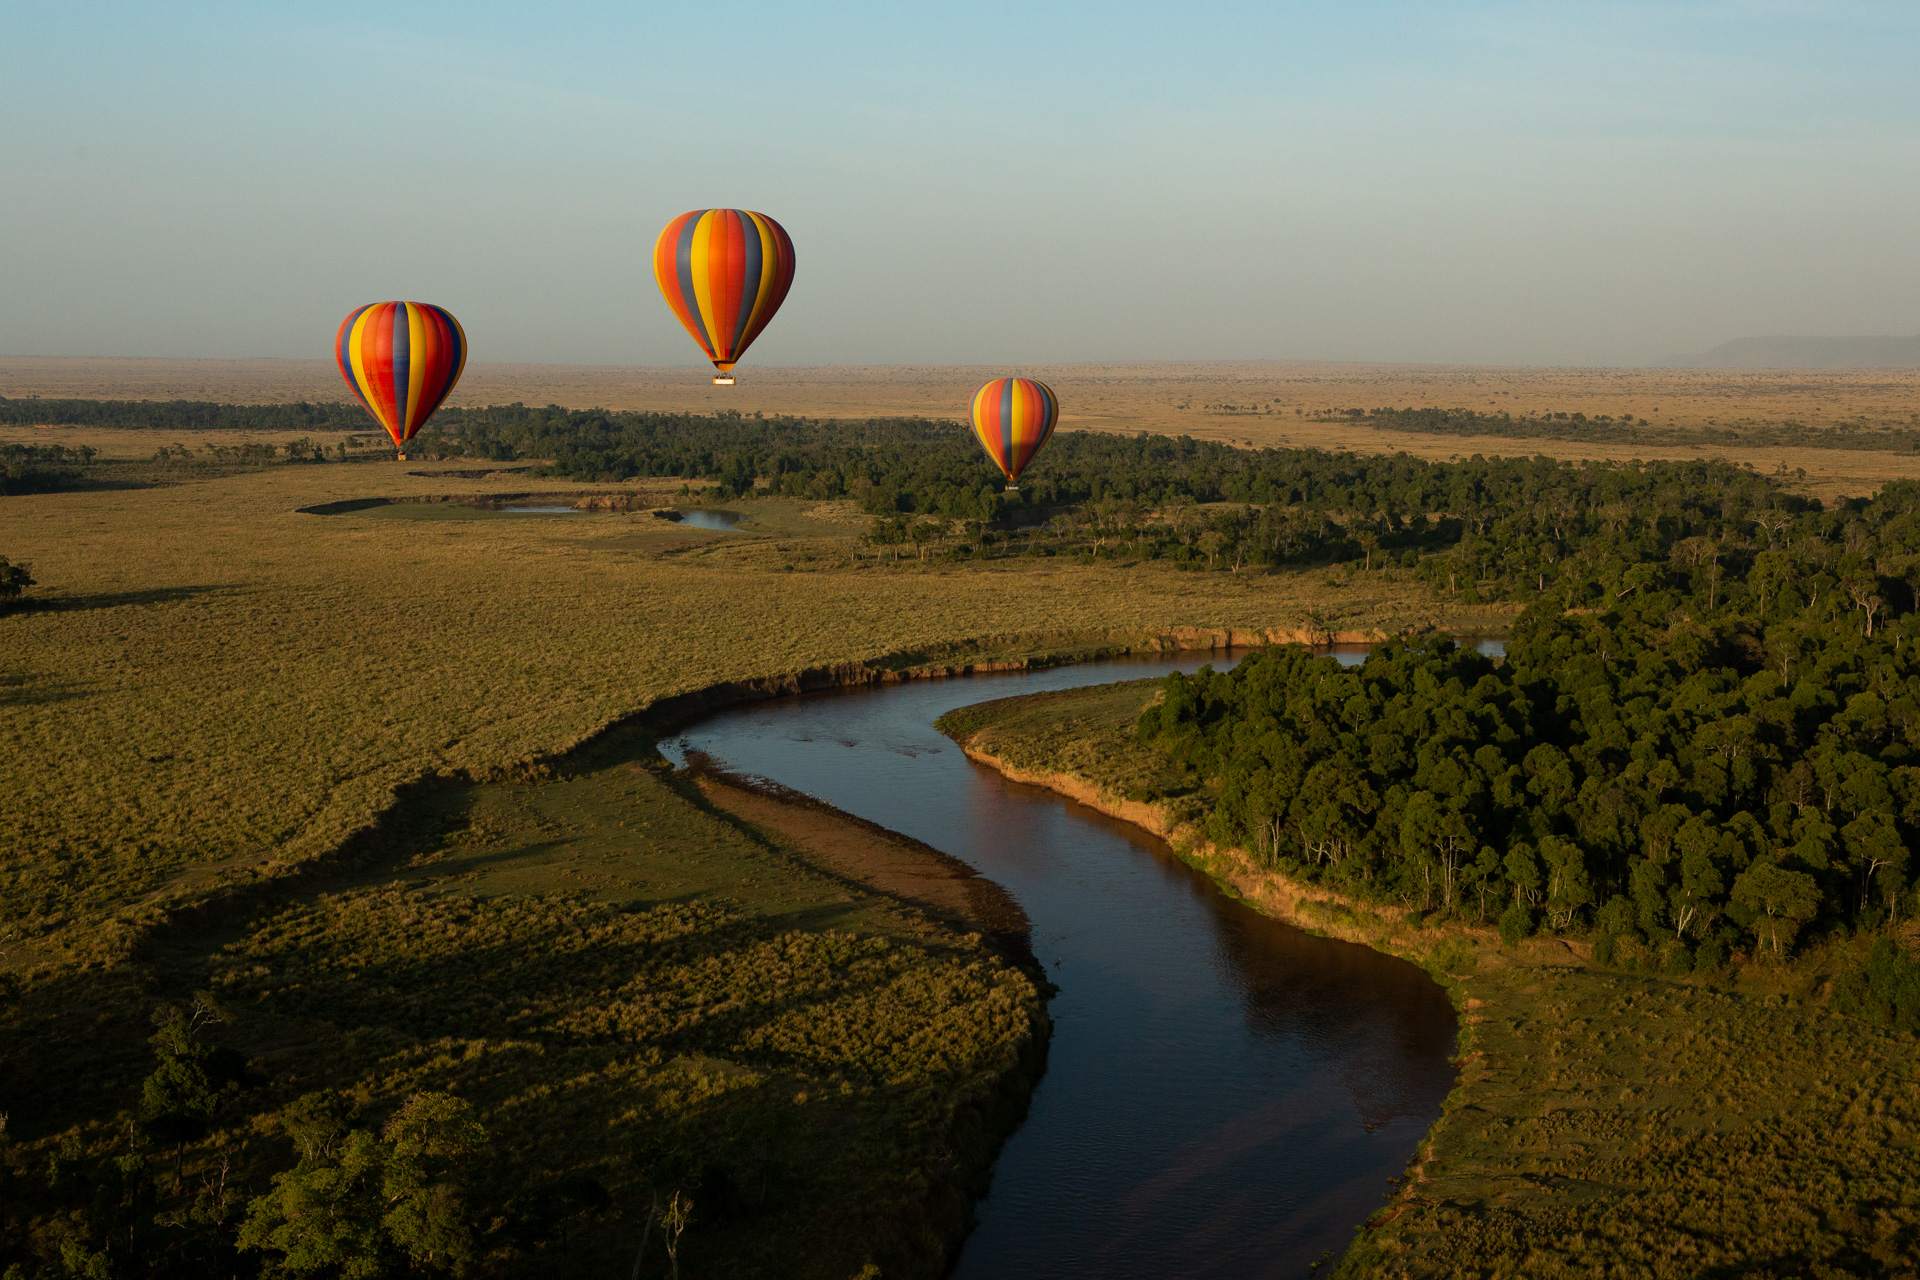 More hot air balloons and river